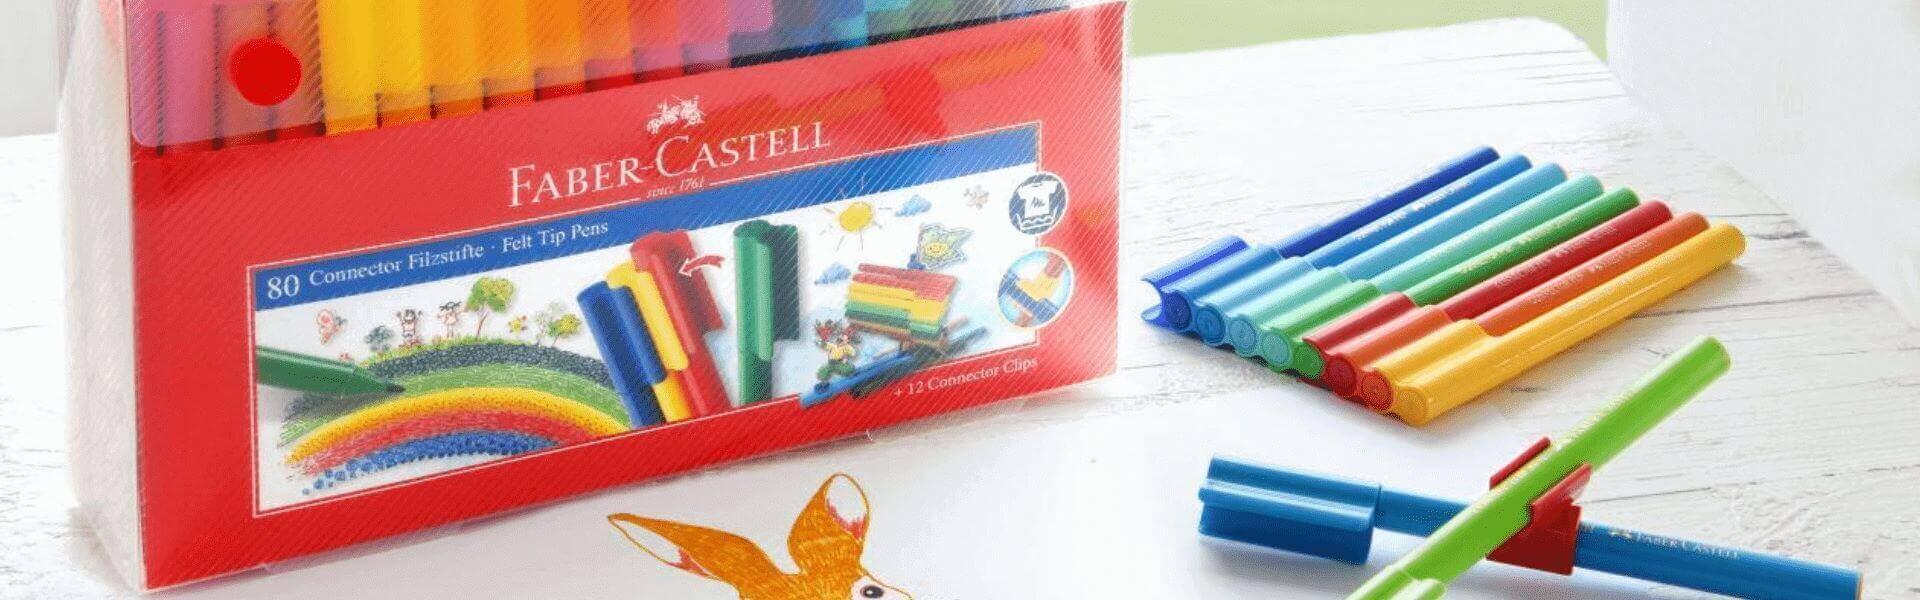 Фломастеры Faber-Castell Connector